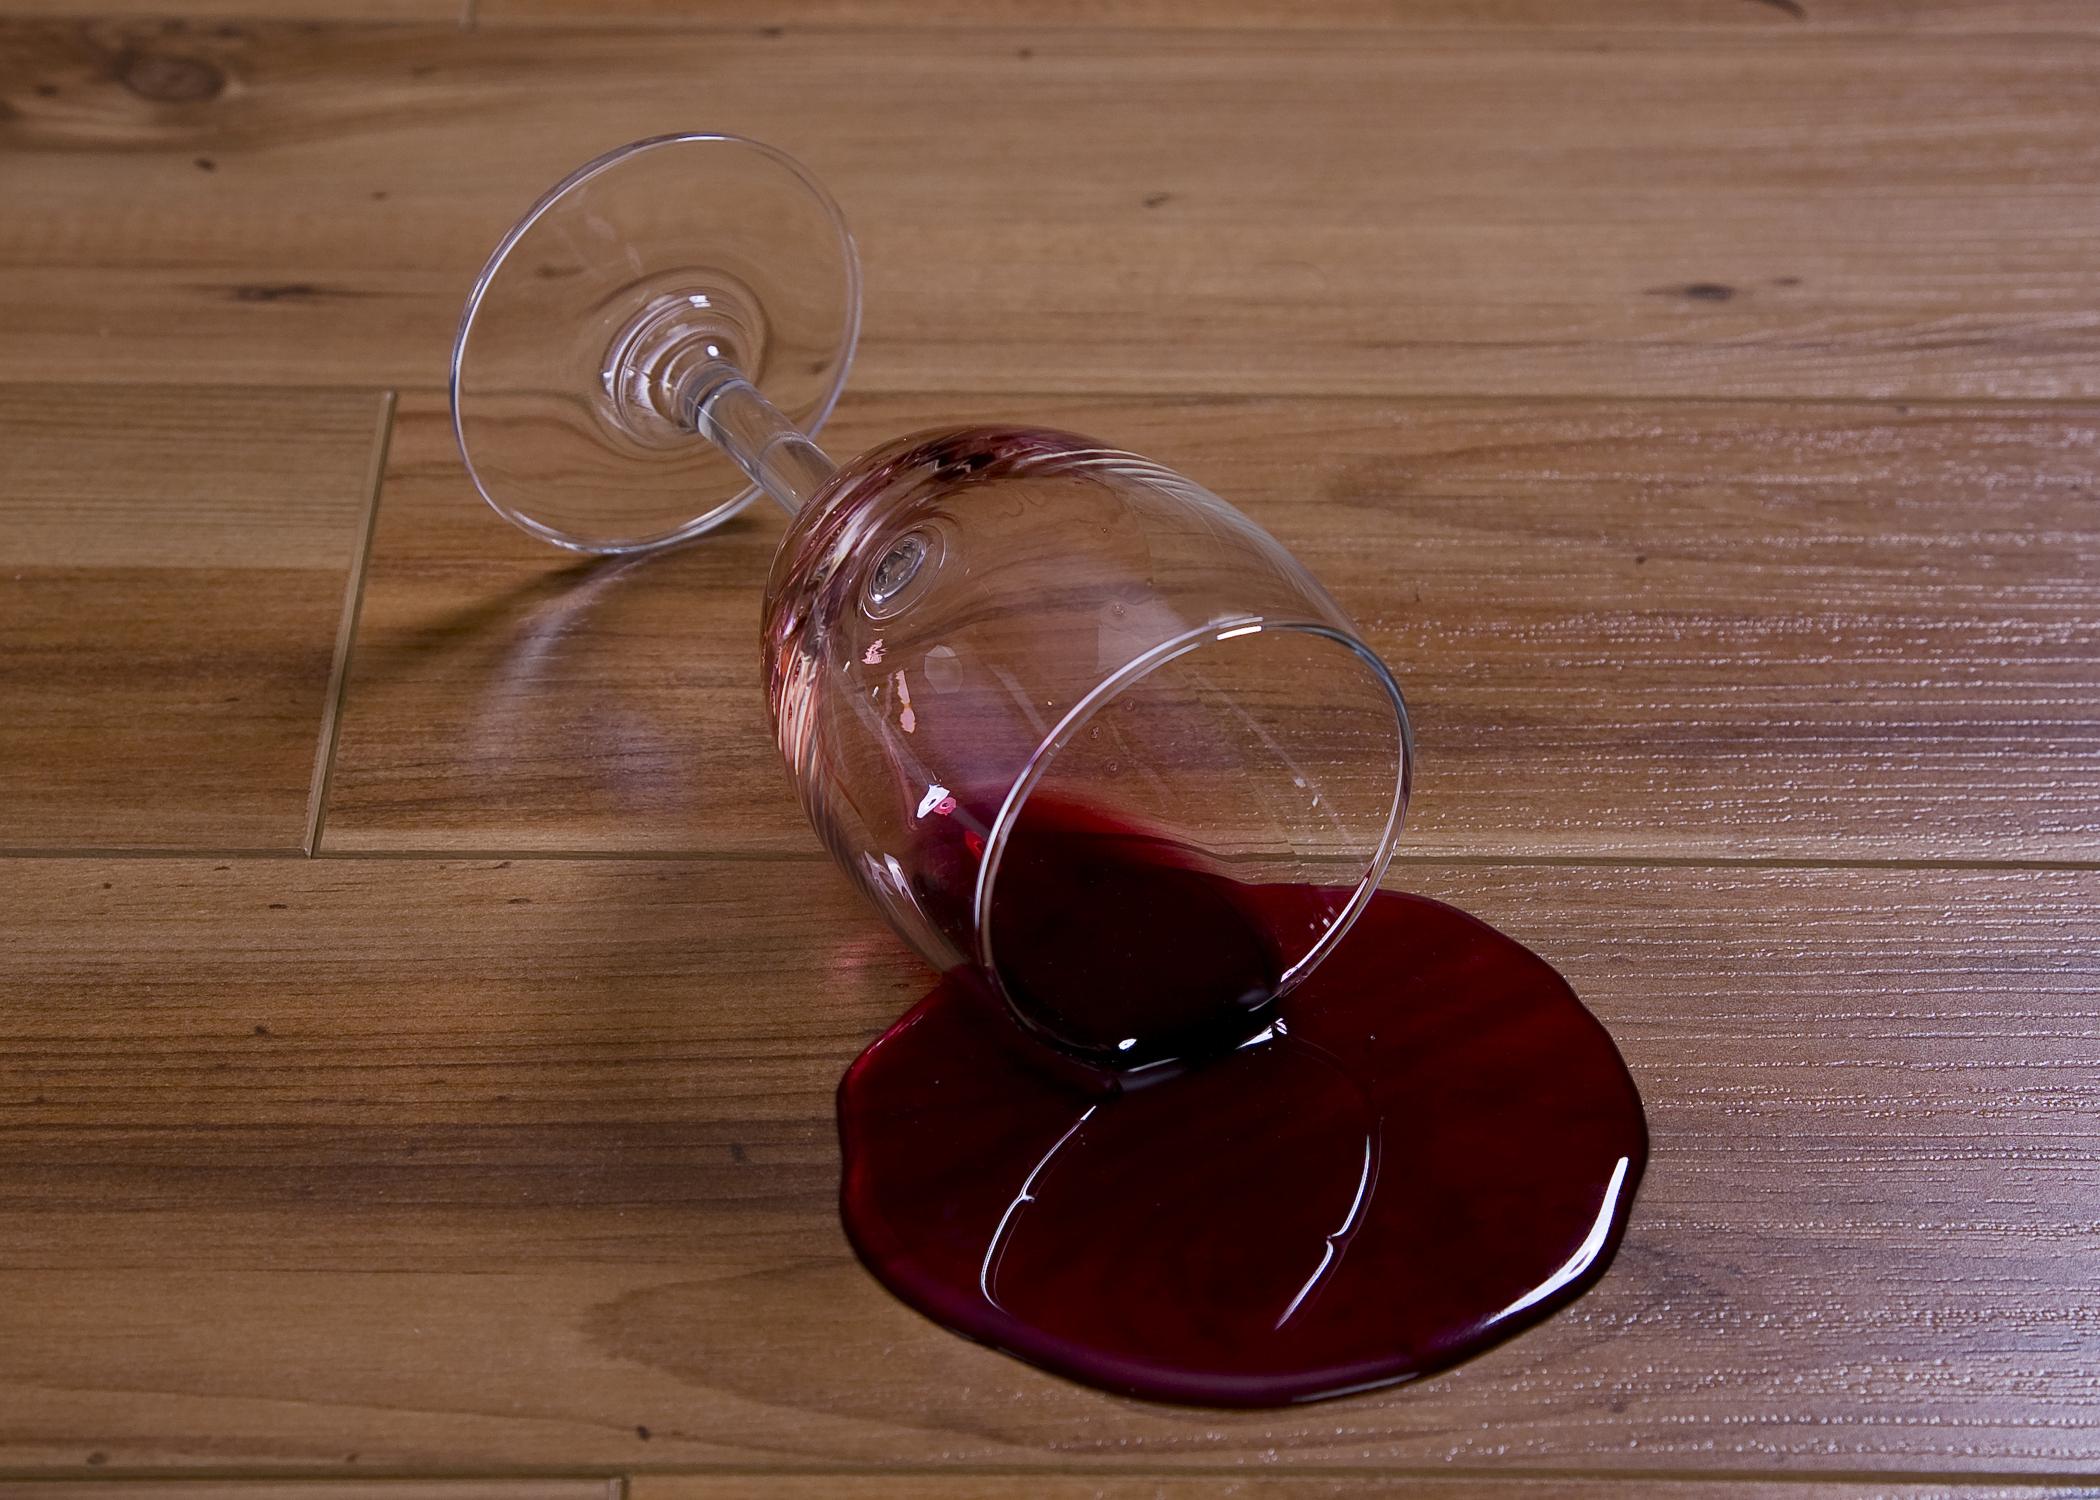 Red Wine Spill on hardwood flooring